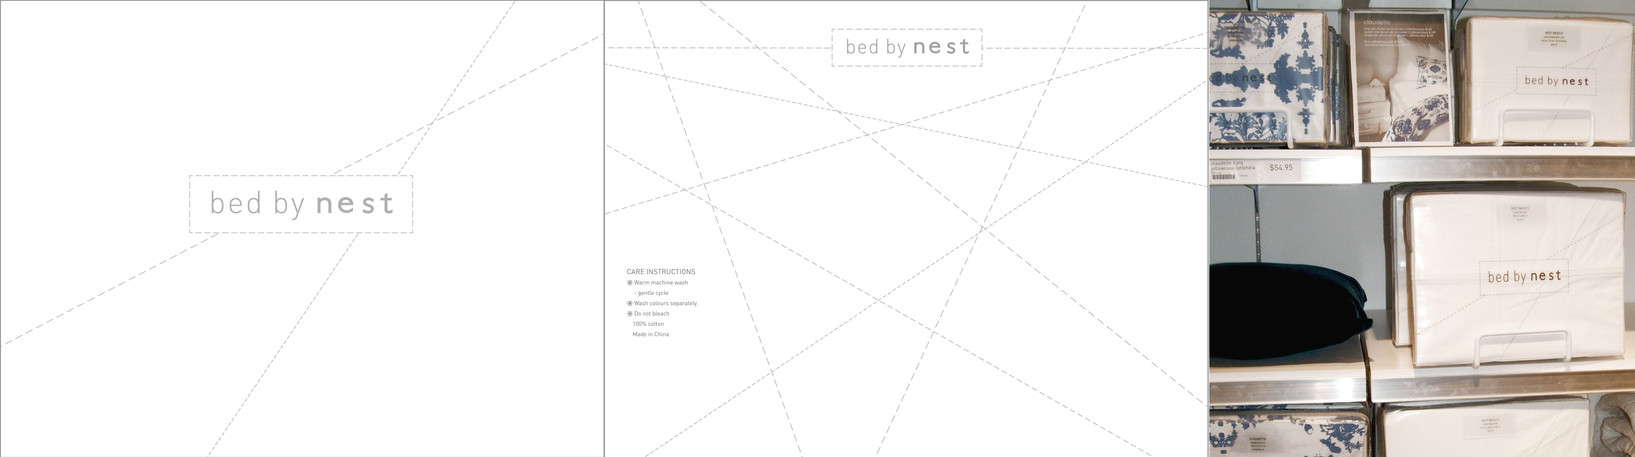 New packaging created for the Nest bedlinen packaging.